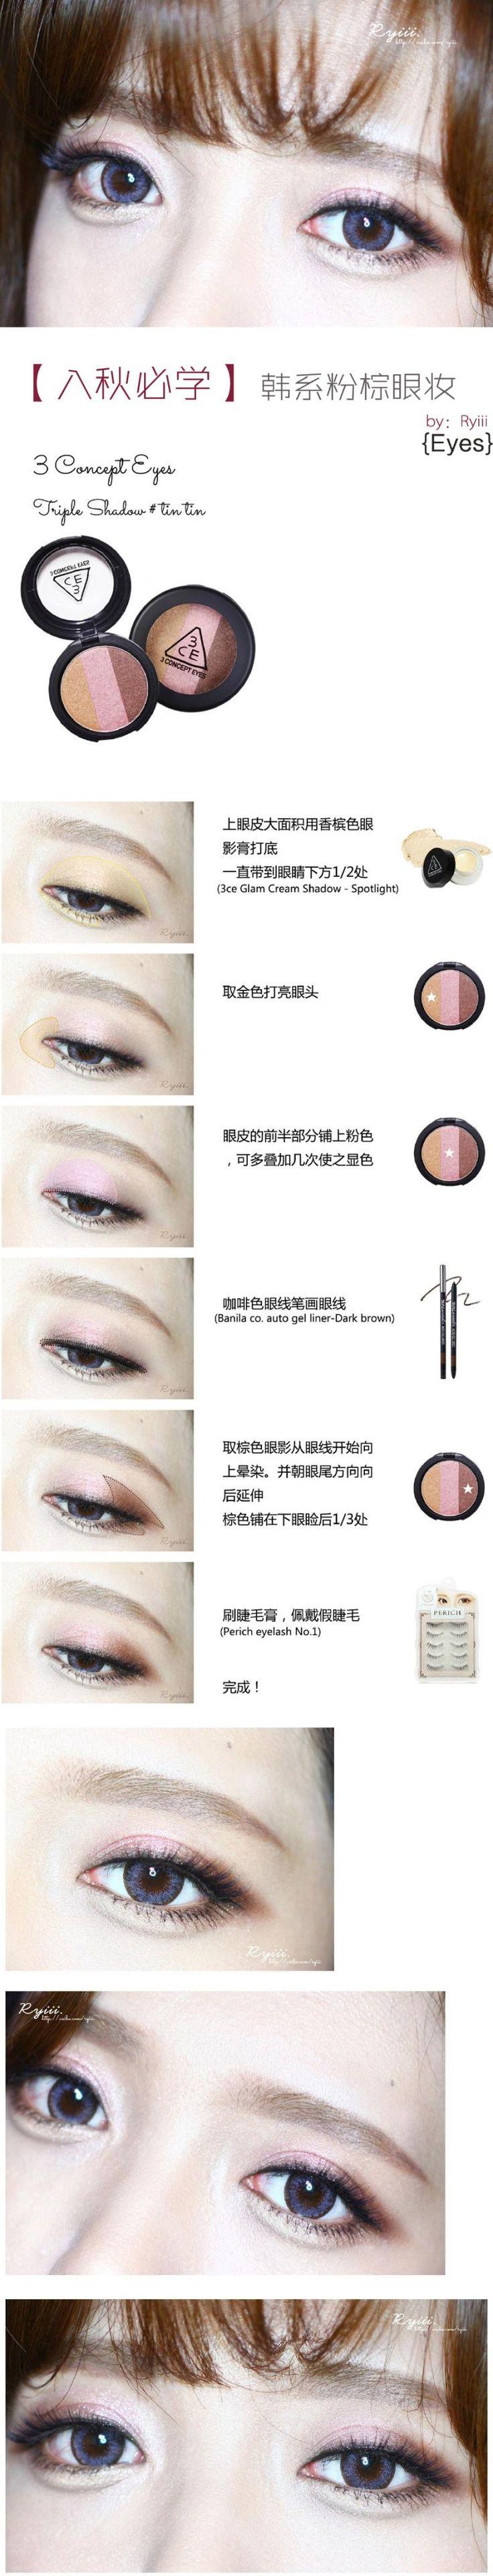 Korean 3CE eye makeup tutorial